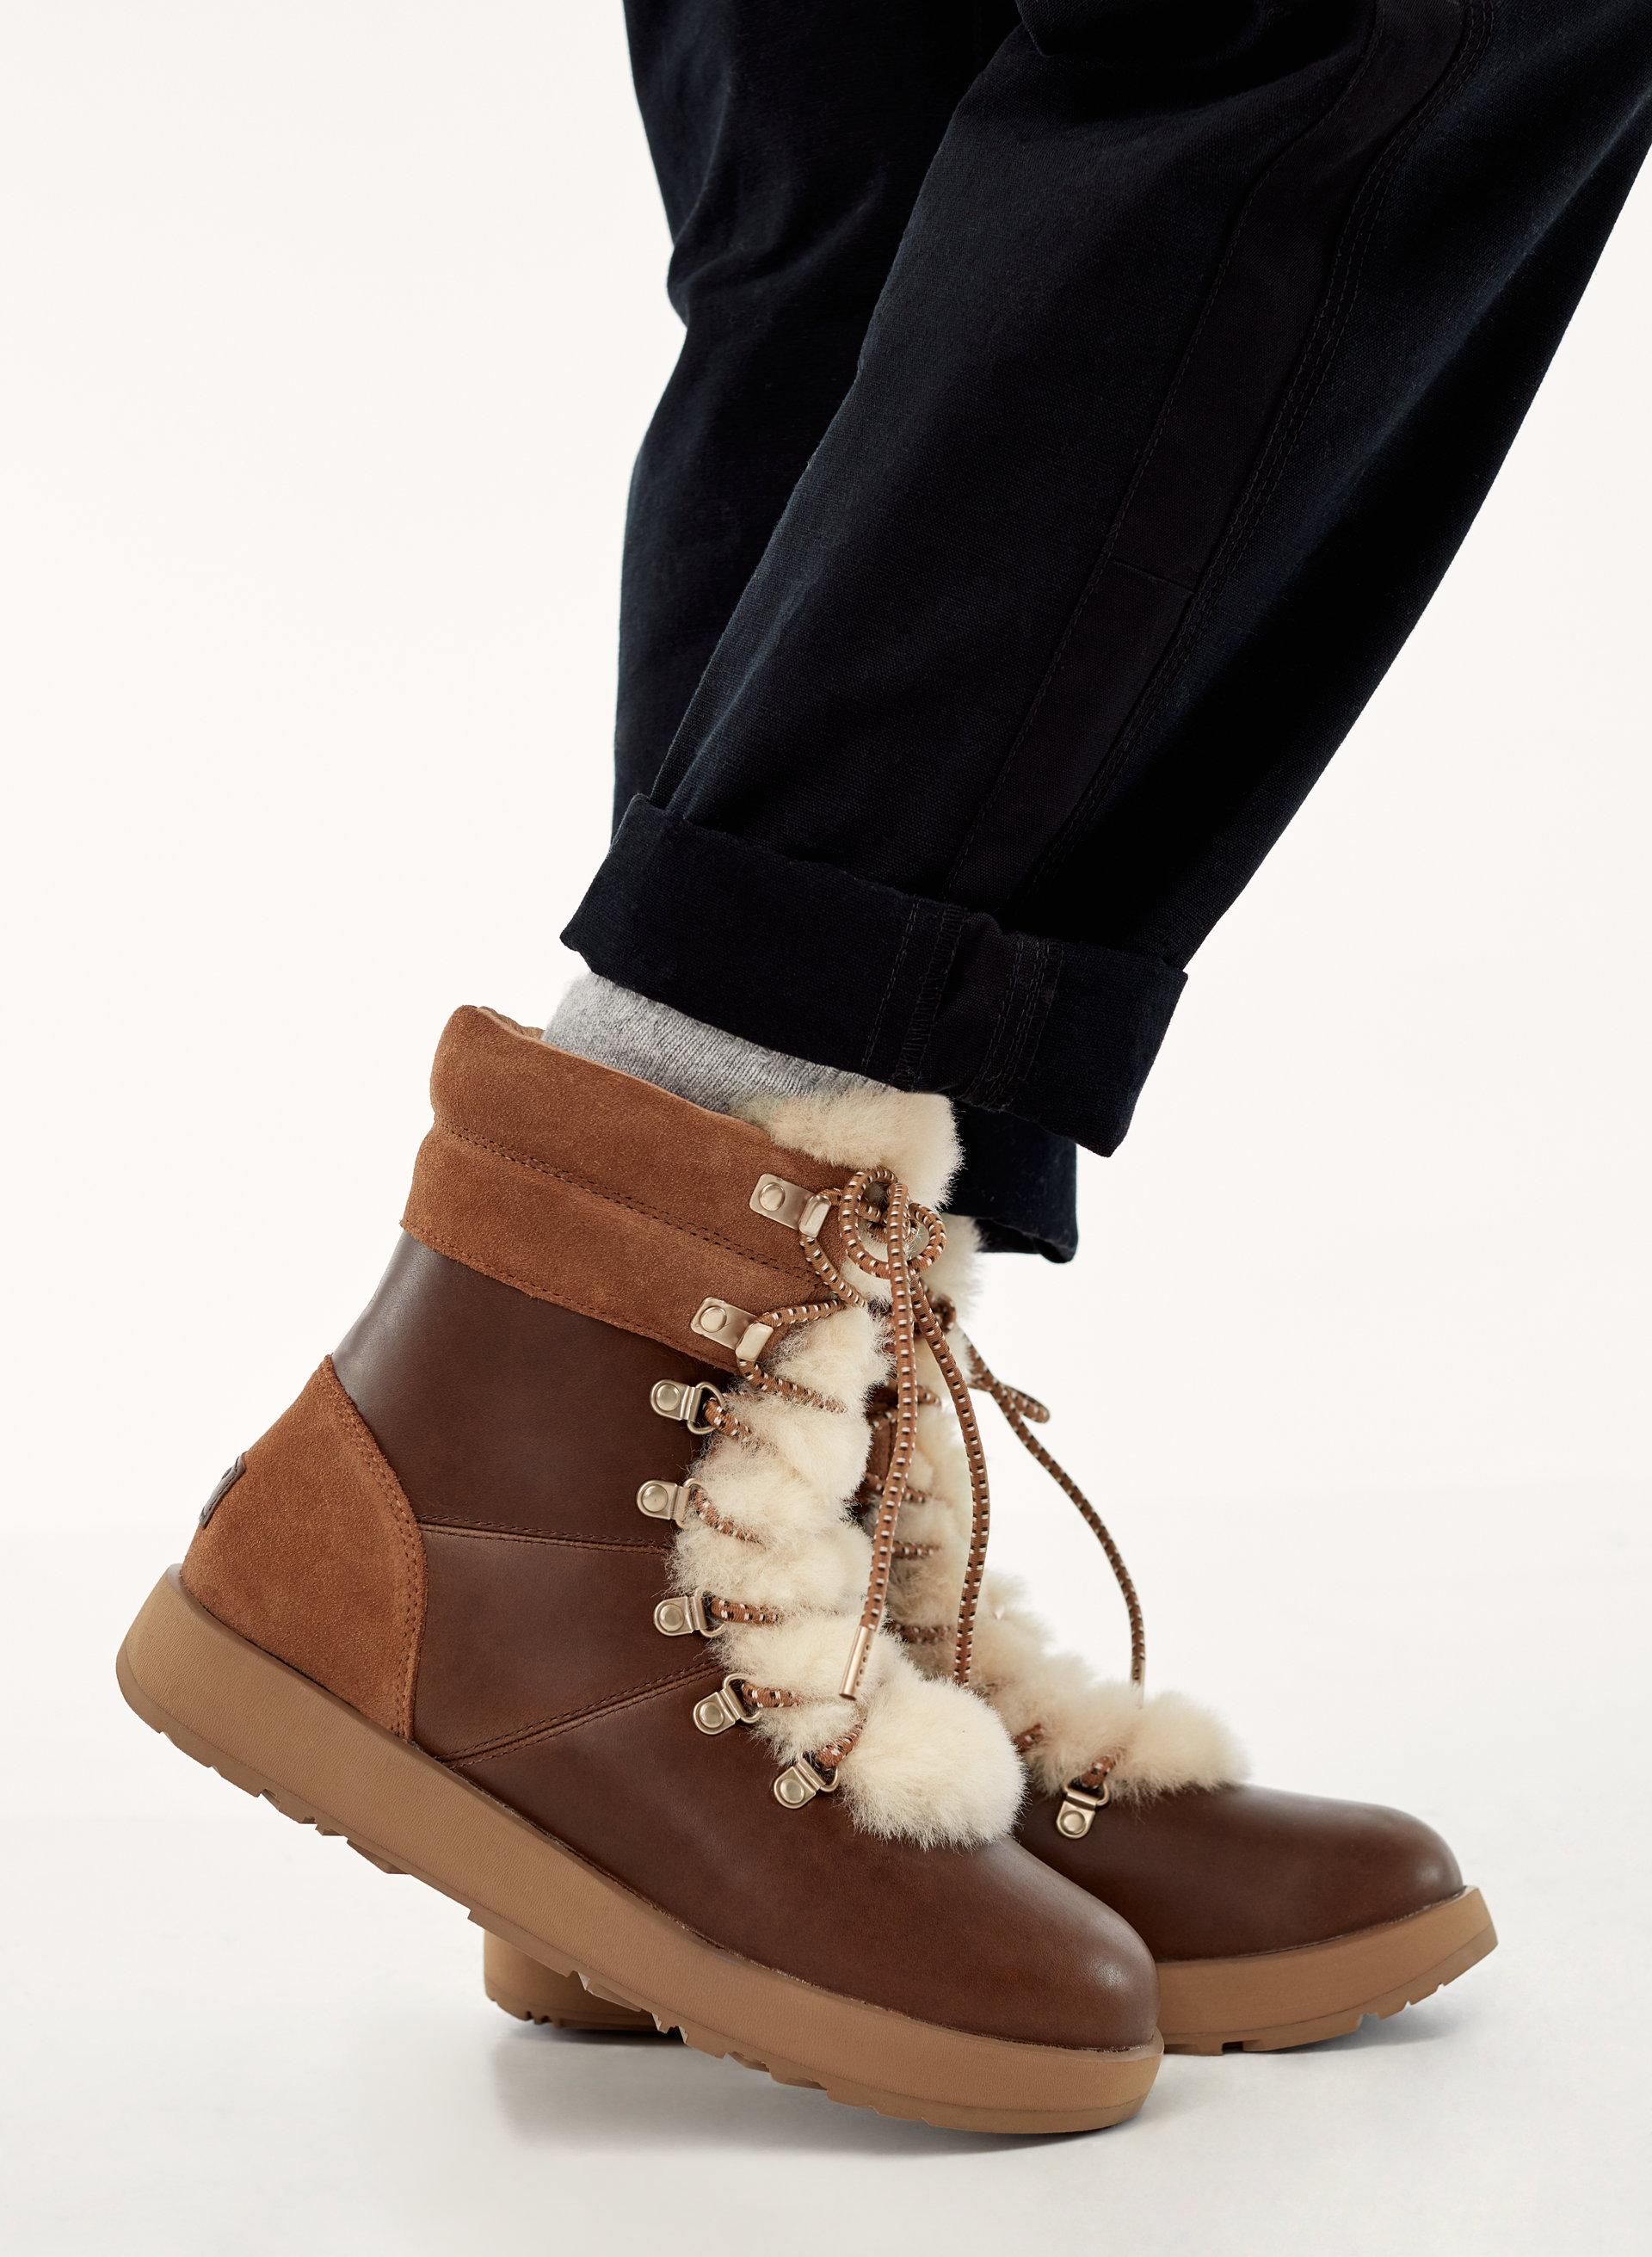 71d89fef0d1 where to buy ugg australia snow boots f53c1 4846c